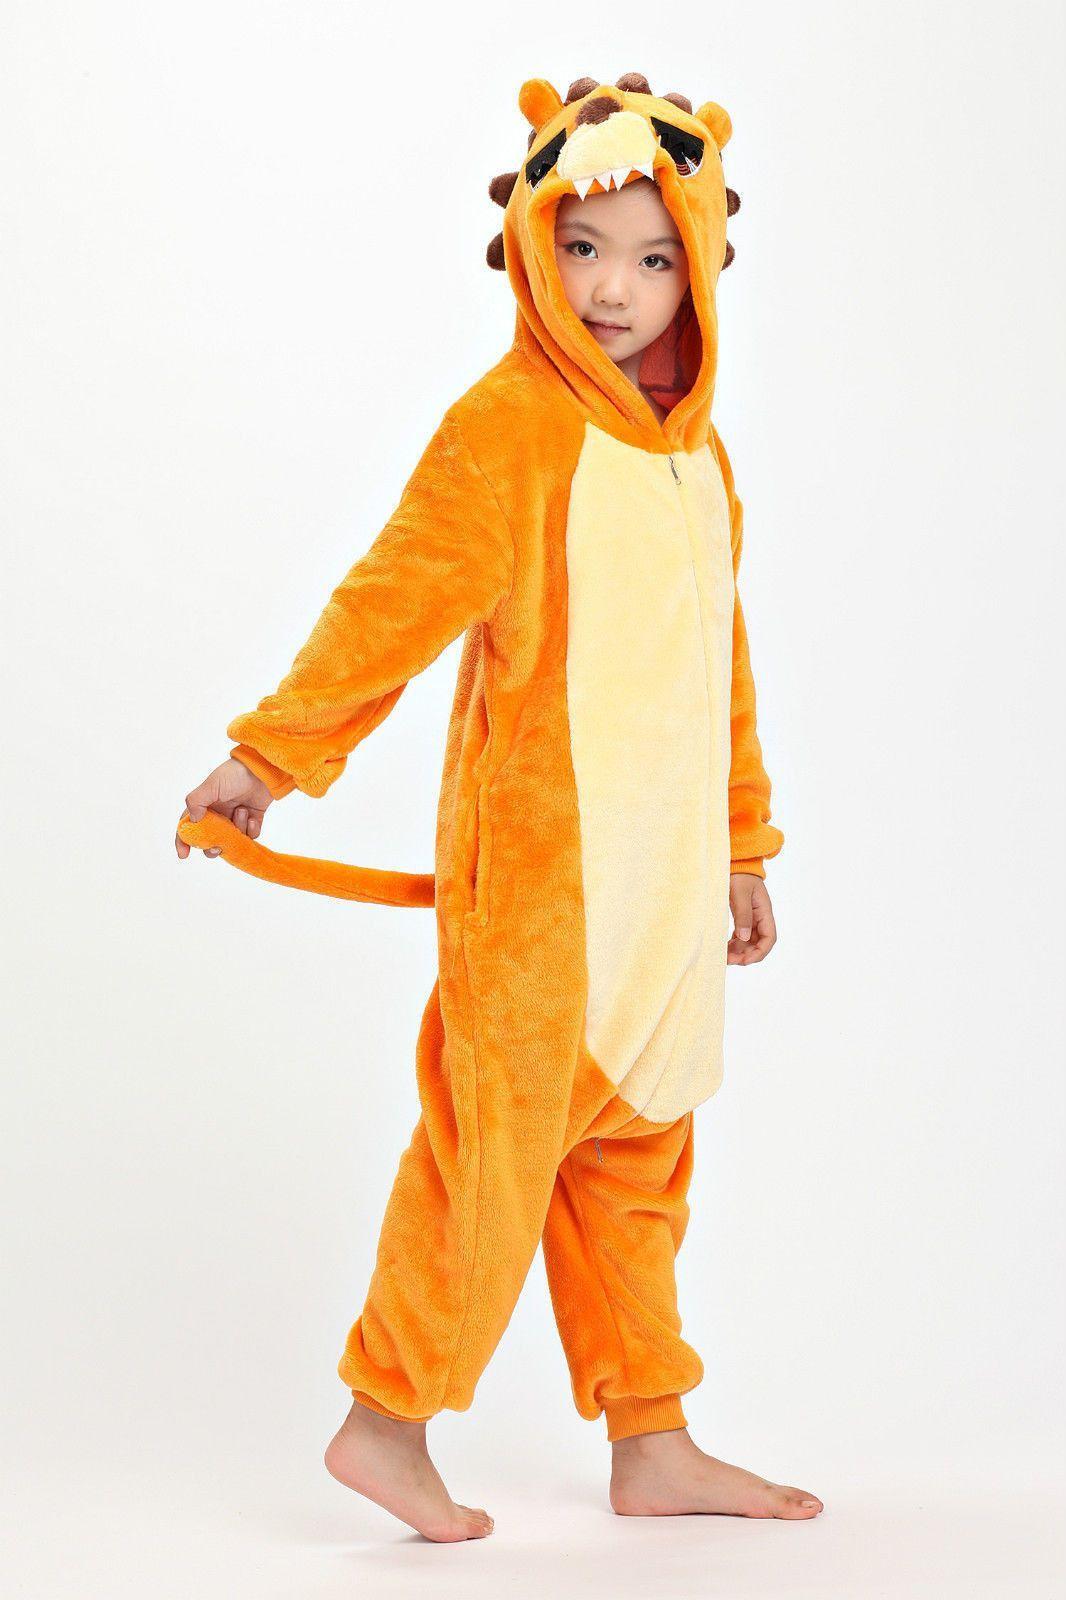 db36f768a96a Lion Onesie for Kids Pajamas